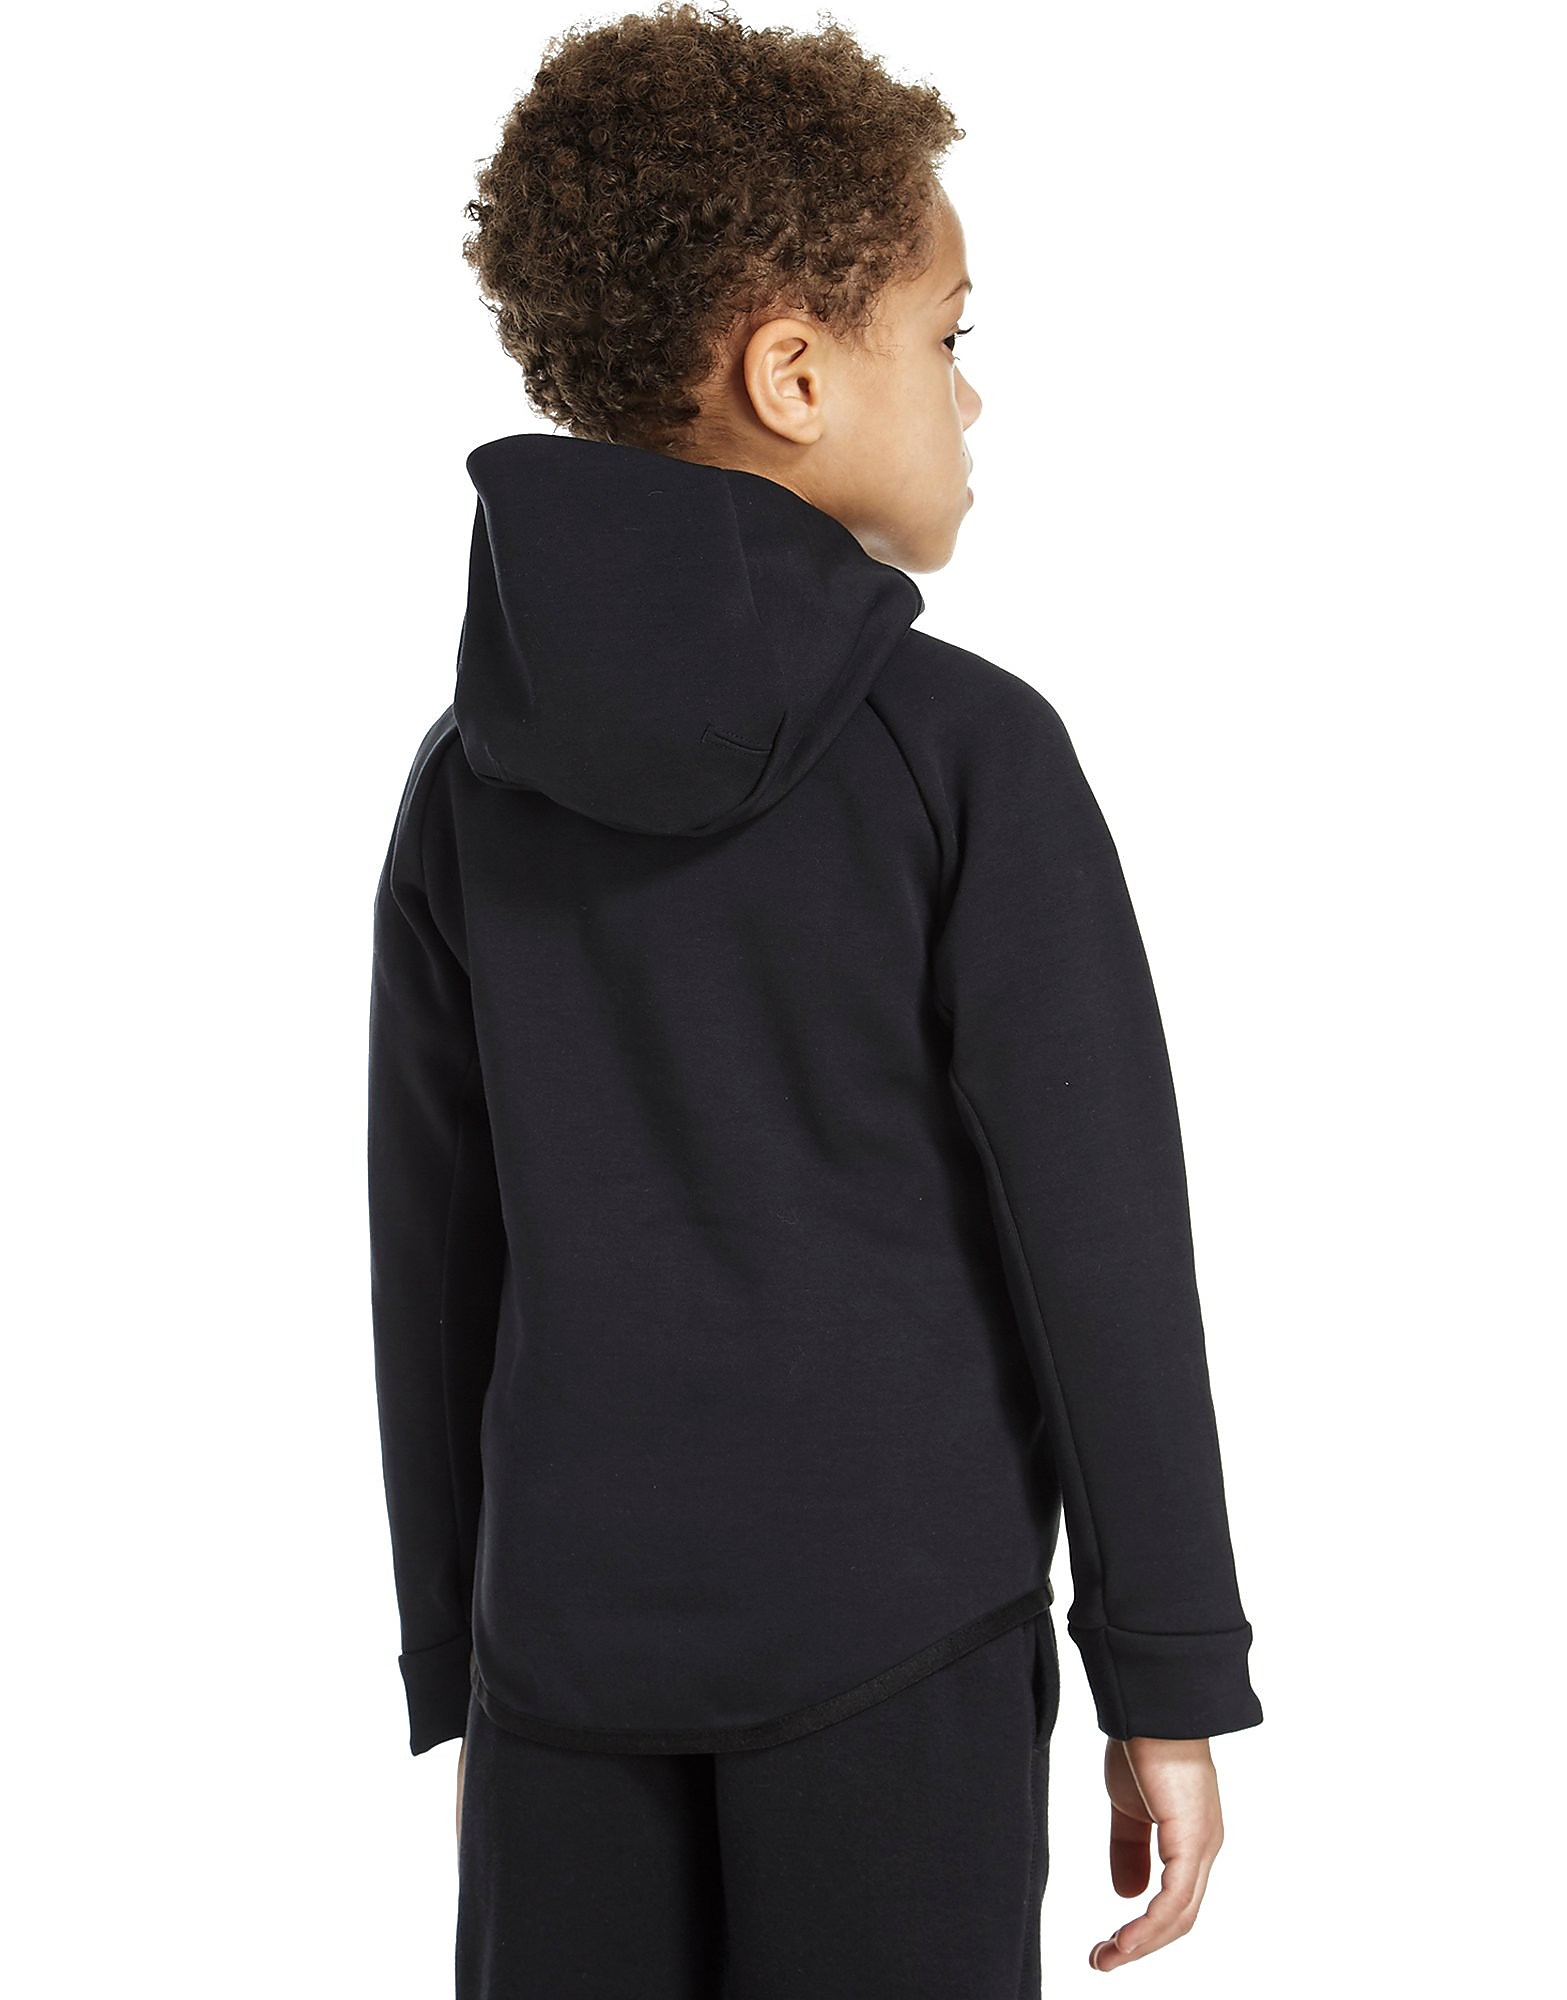 Nike Tech Fleece Hoody Children